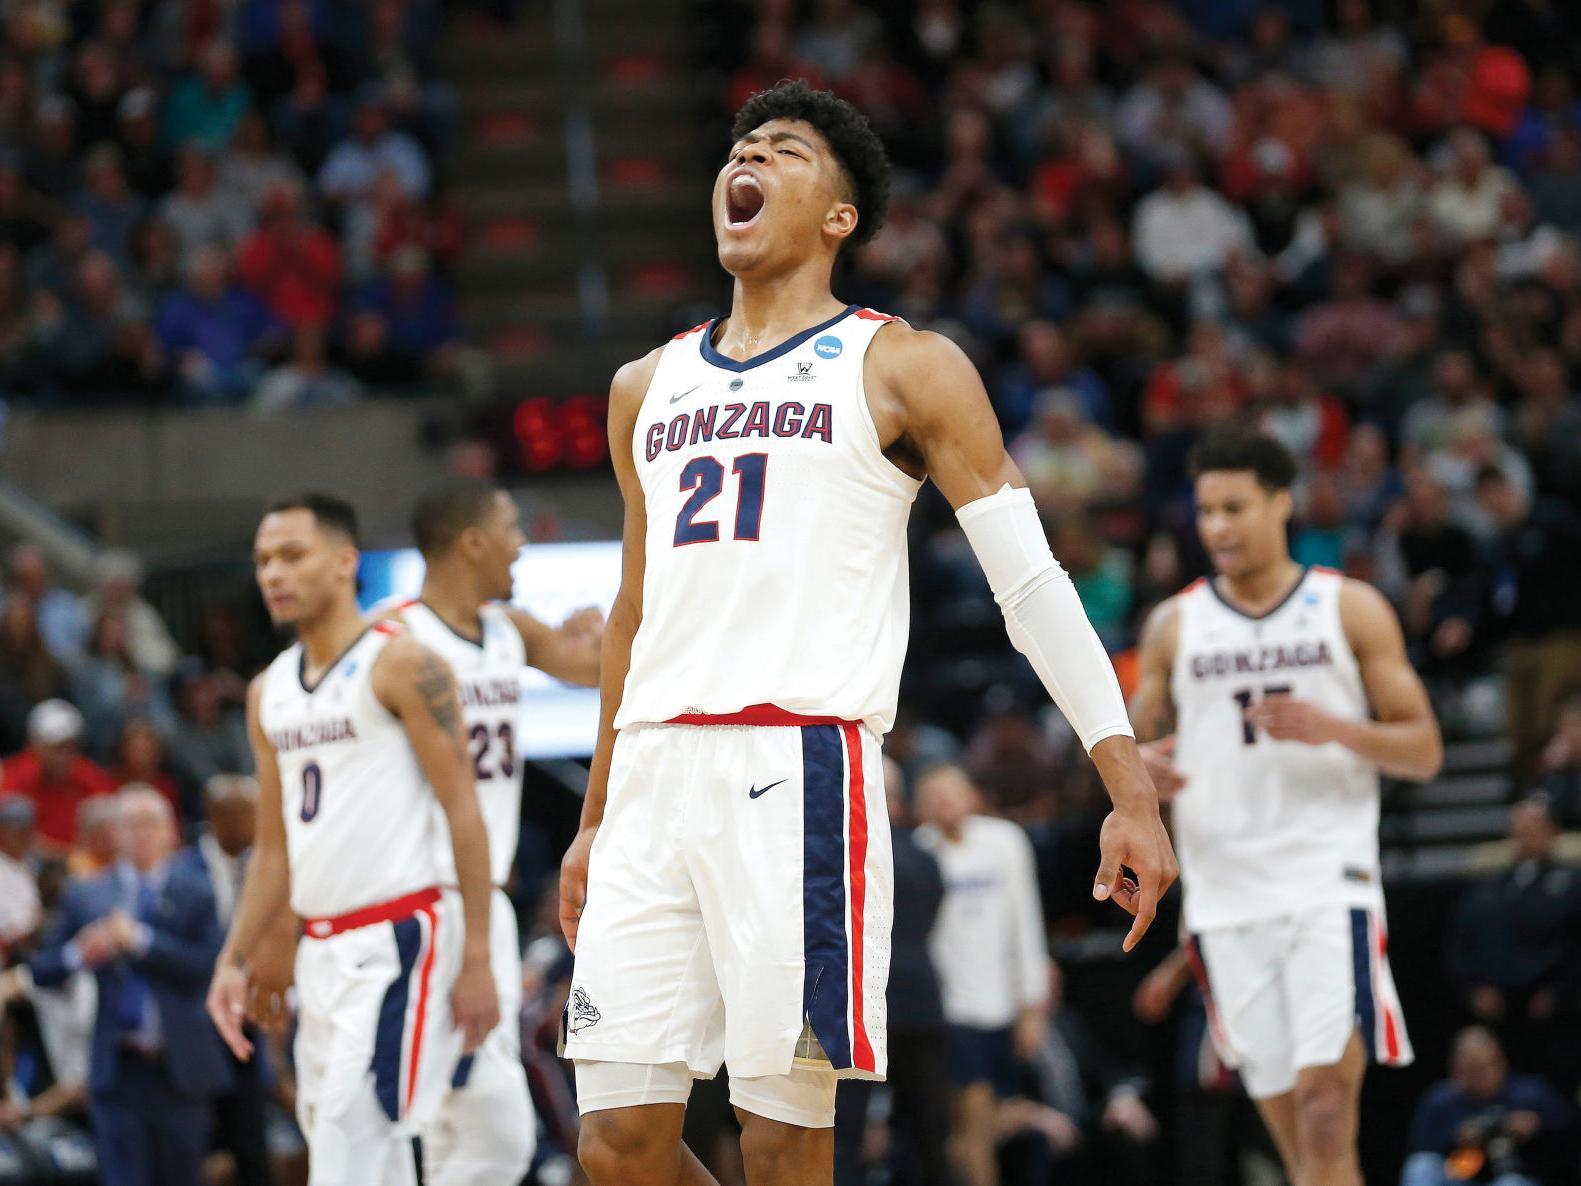 Gonzaga men's basketball has no trouble in NCAA tournament opener   News Watch   yakimaherald.com